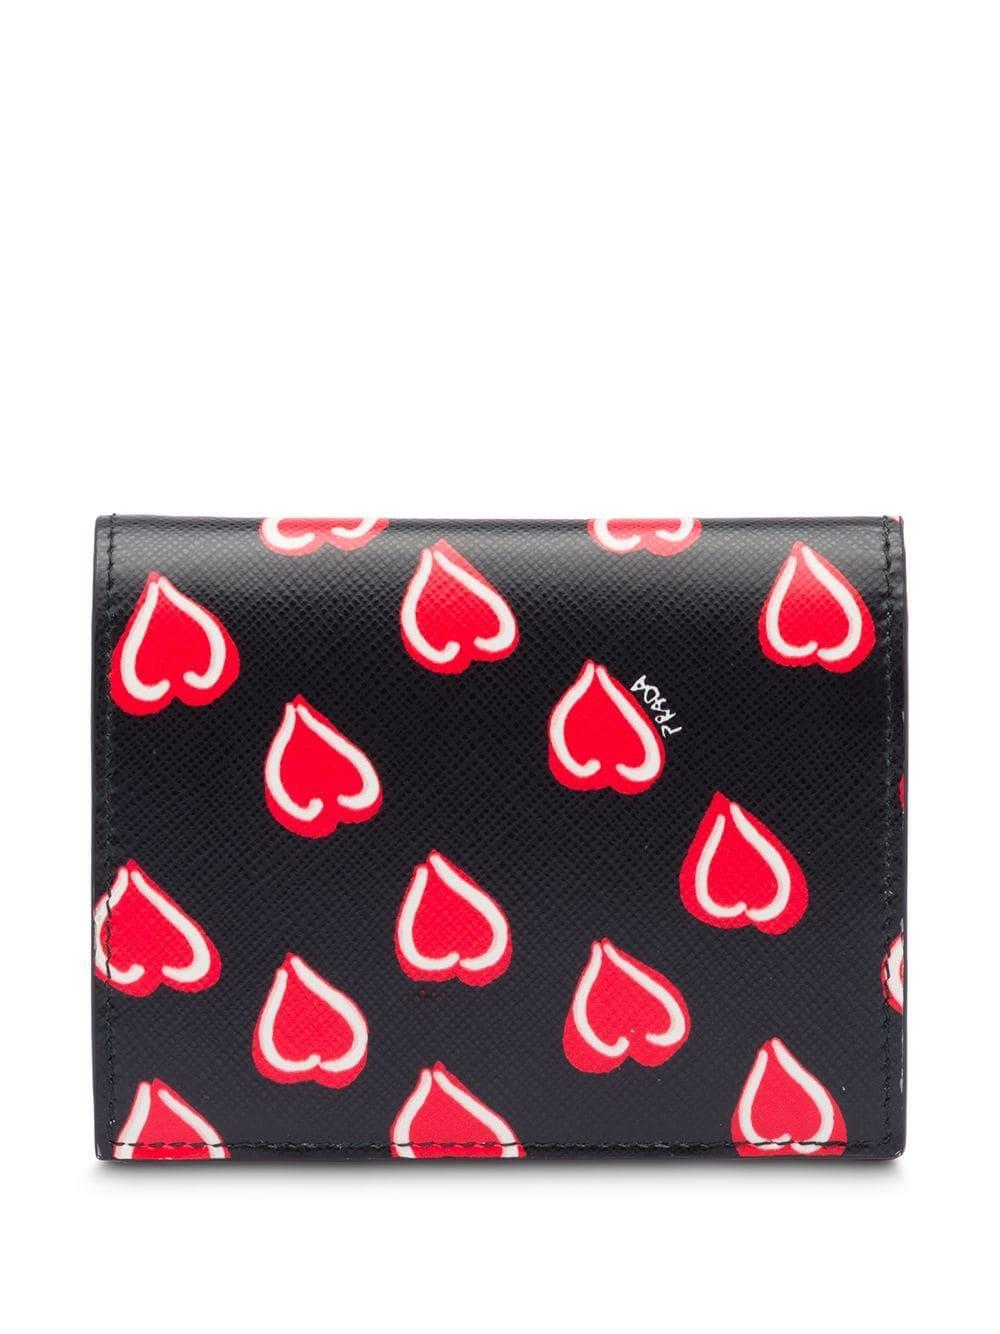 182c584b19 Prada - Black Small Saffiano Leather Wallet - Lyst. View fullscreen